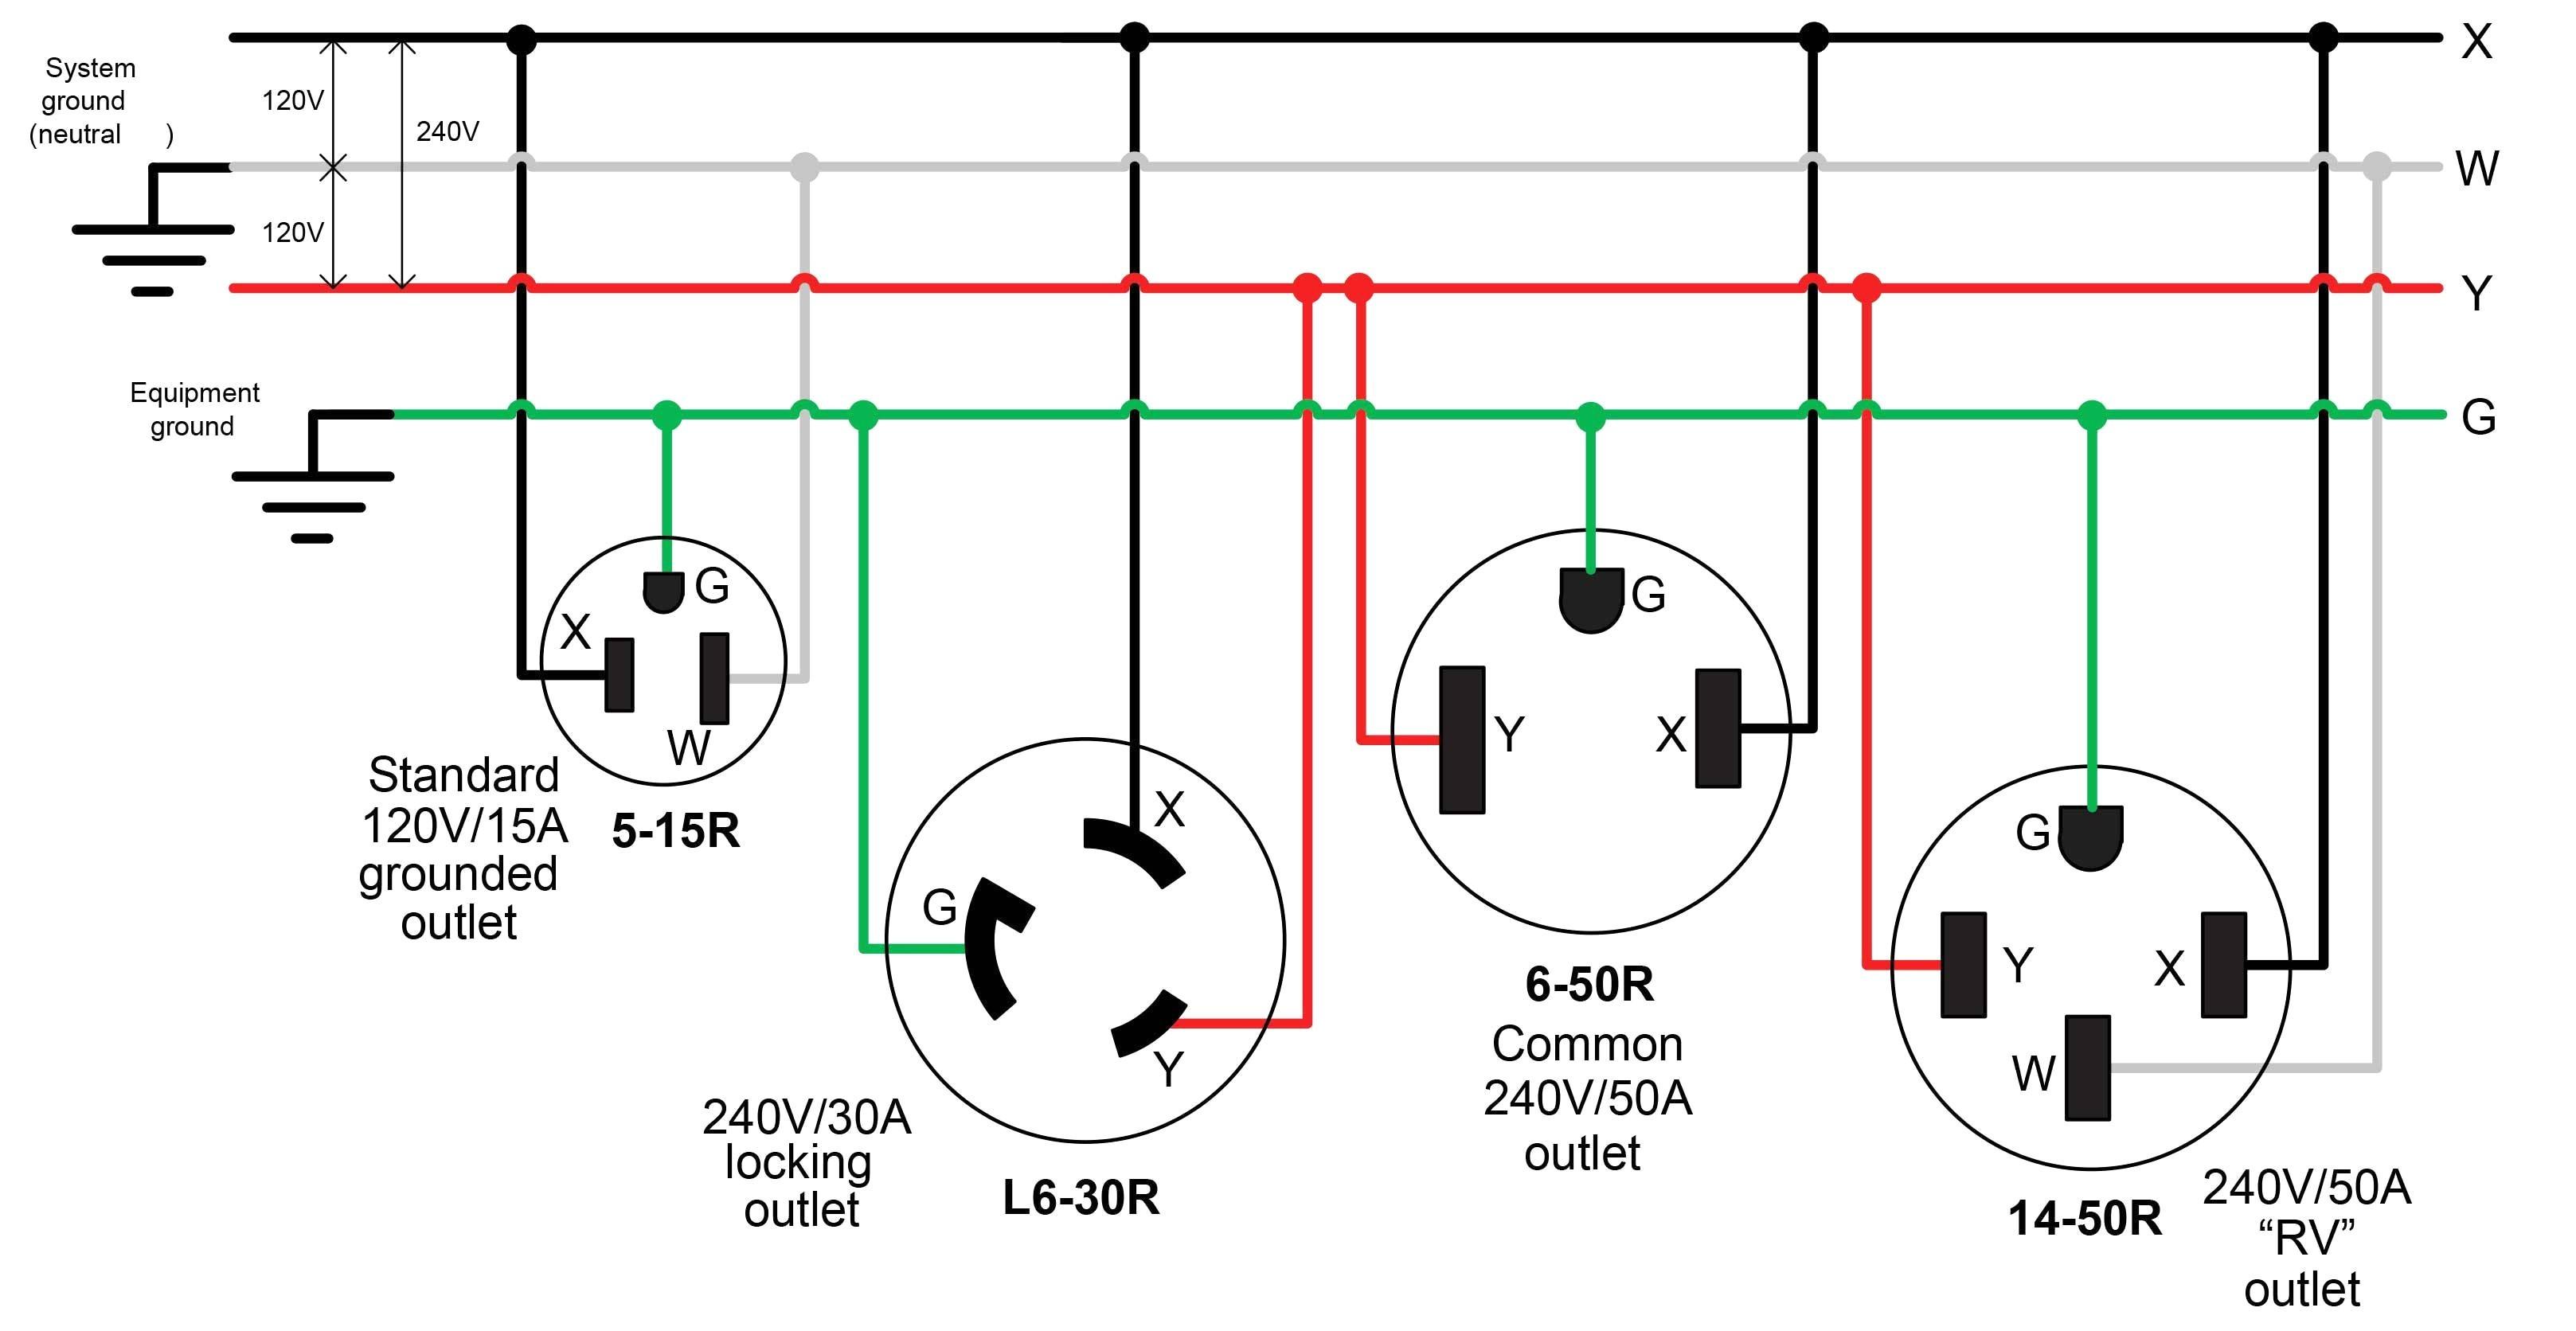 50 Amp Rv Plug Wiring Diagram Wiring Diagram for 30 Amp Breaker Box Best 4 Prong Generator Plug Of 50 Amp Rv Plug Wiring Diagram